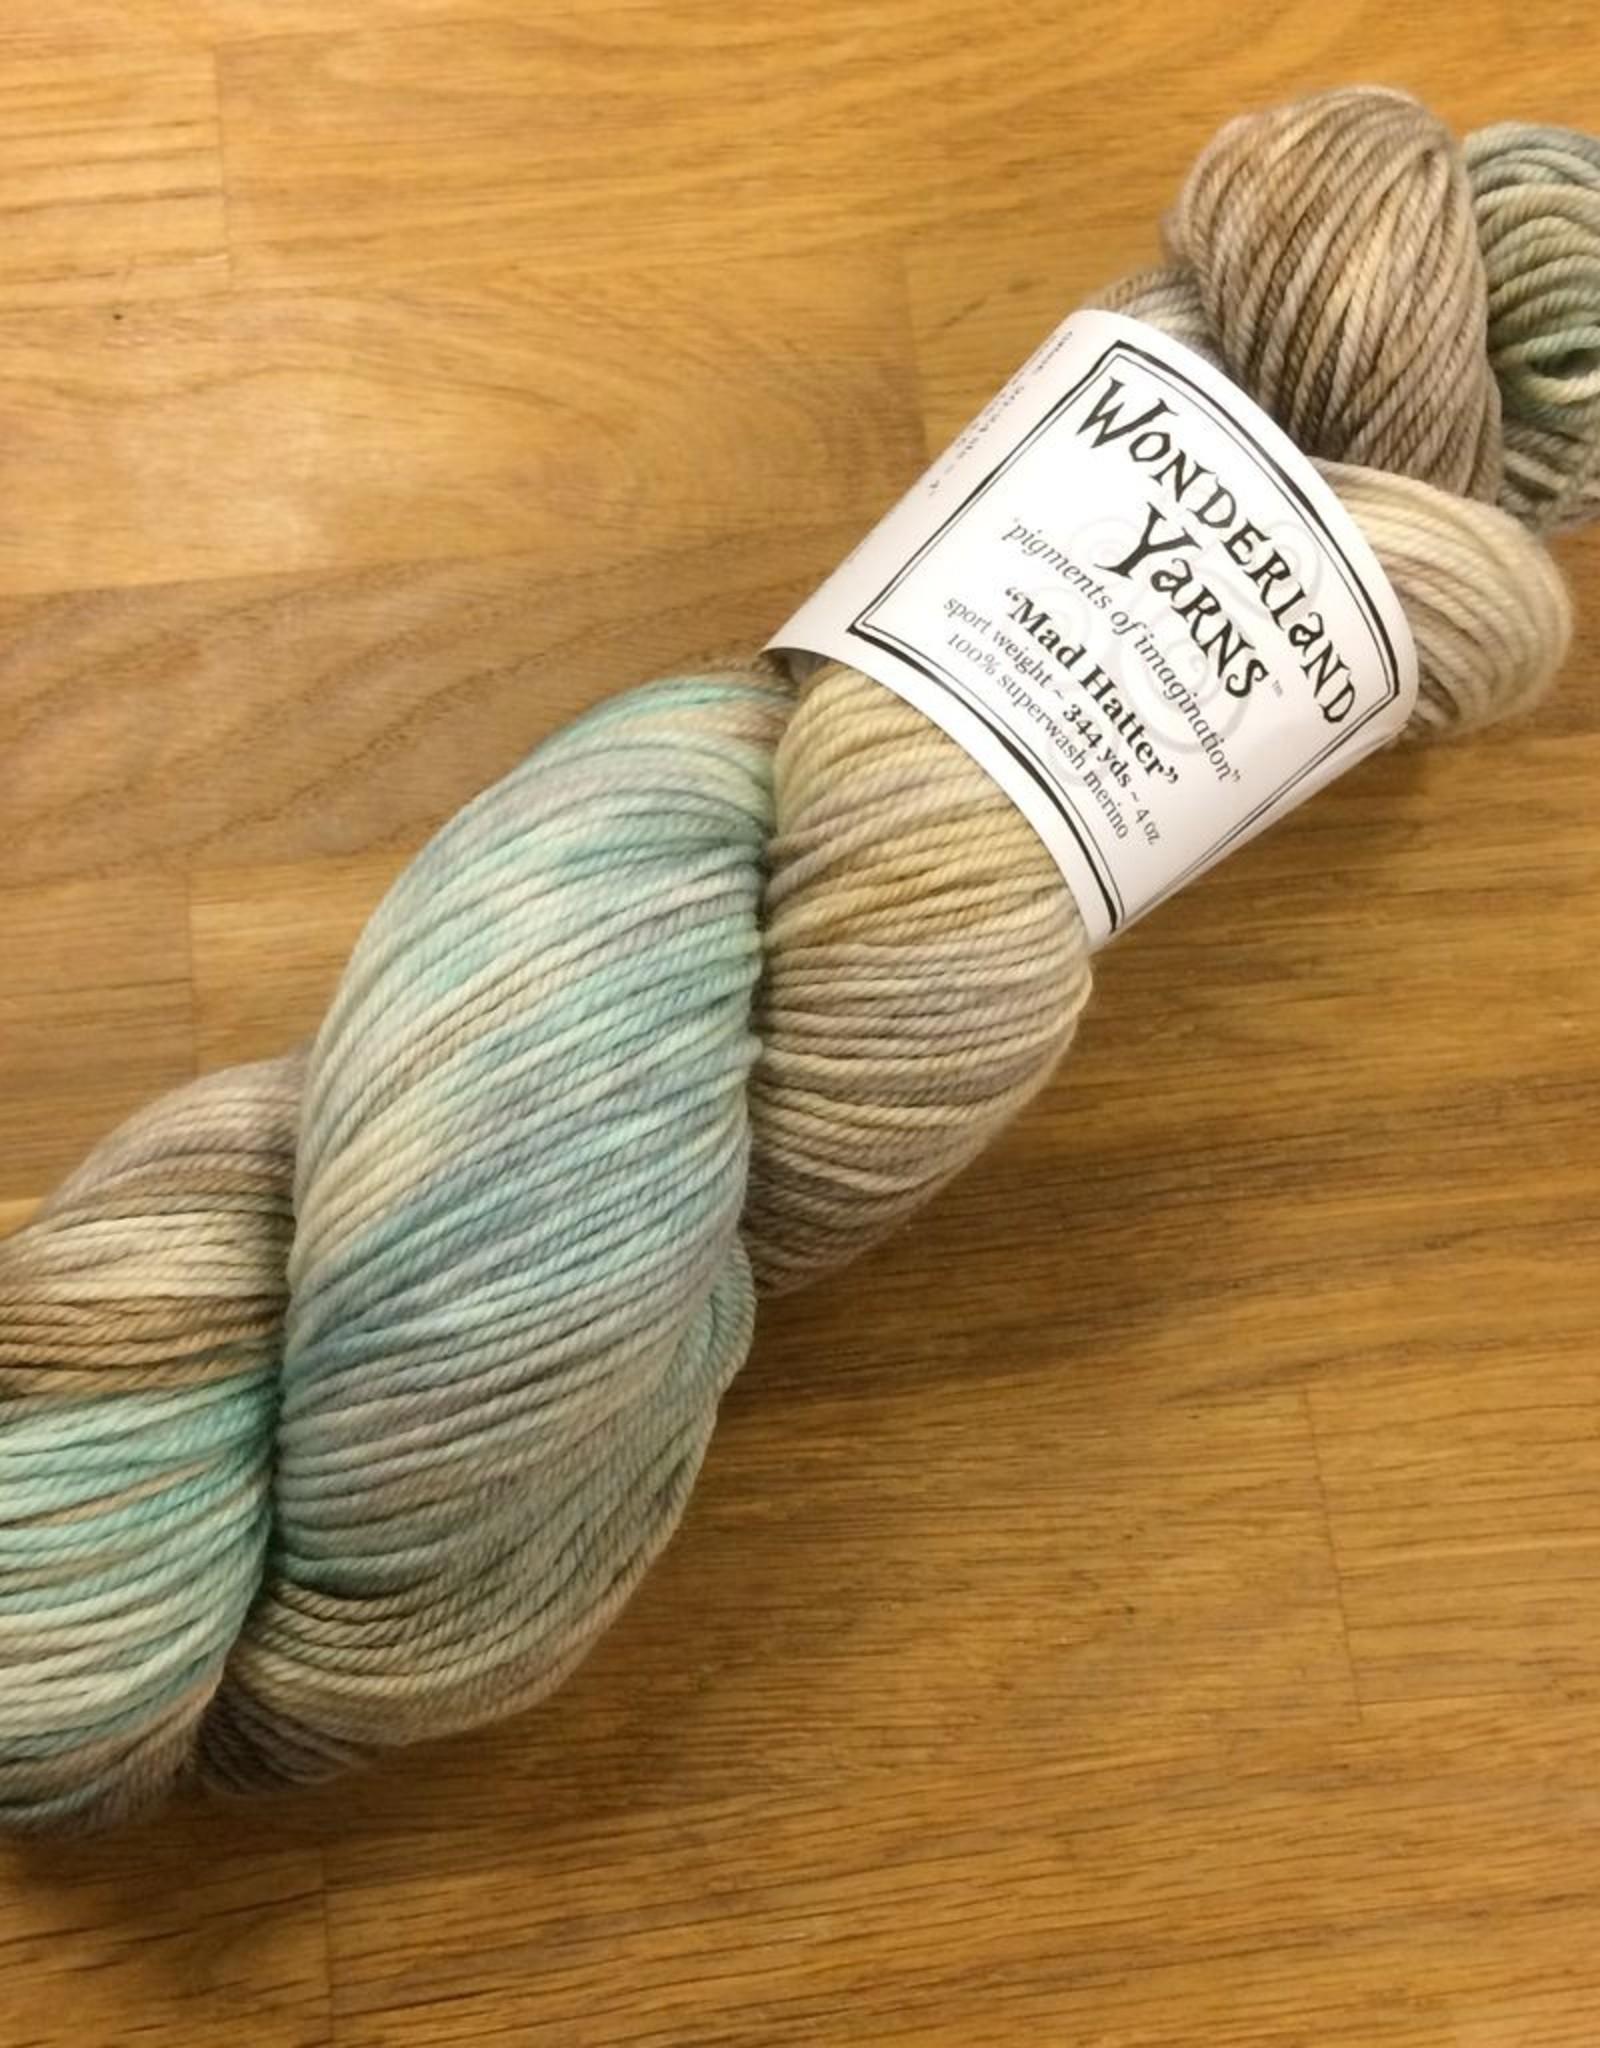 Wonderland Yarn Mad Hatter by Wonderland Yarn - Year in Color